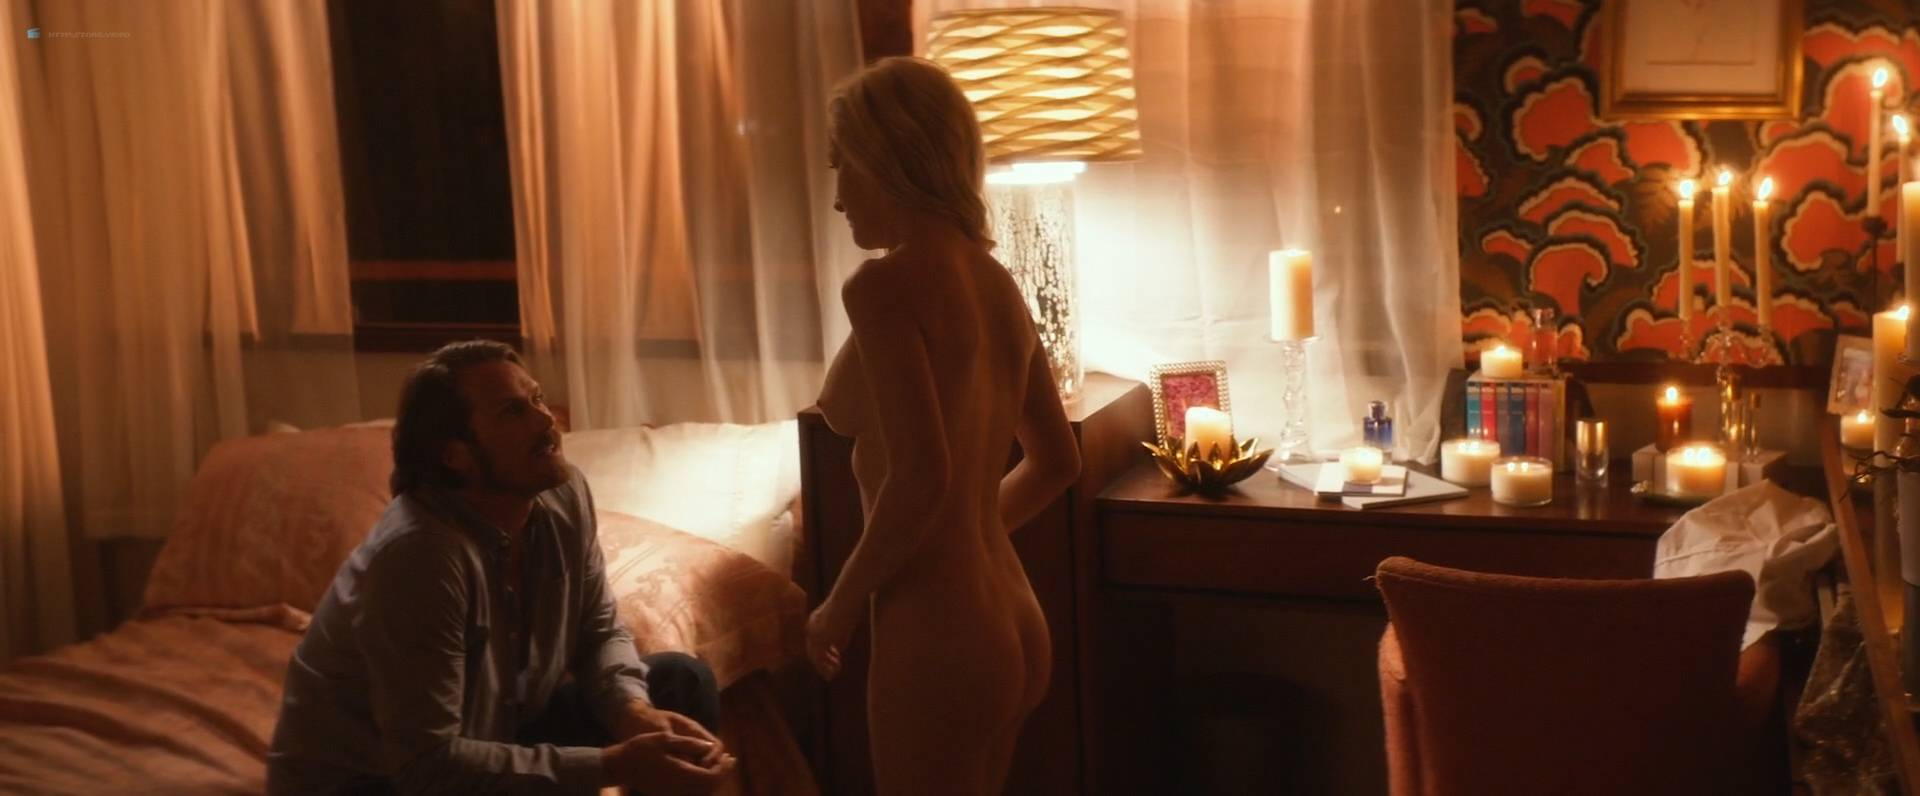 Heather-Graham-nude-sex-Angela-Kinsey-nude-butt-Stephanie-Beatriz-hot-Half-Magic-2018-HD-1080p-016.jpg